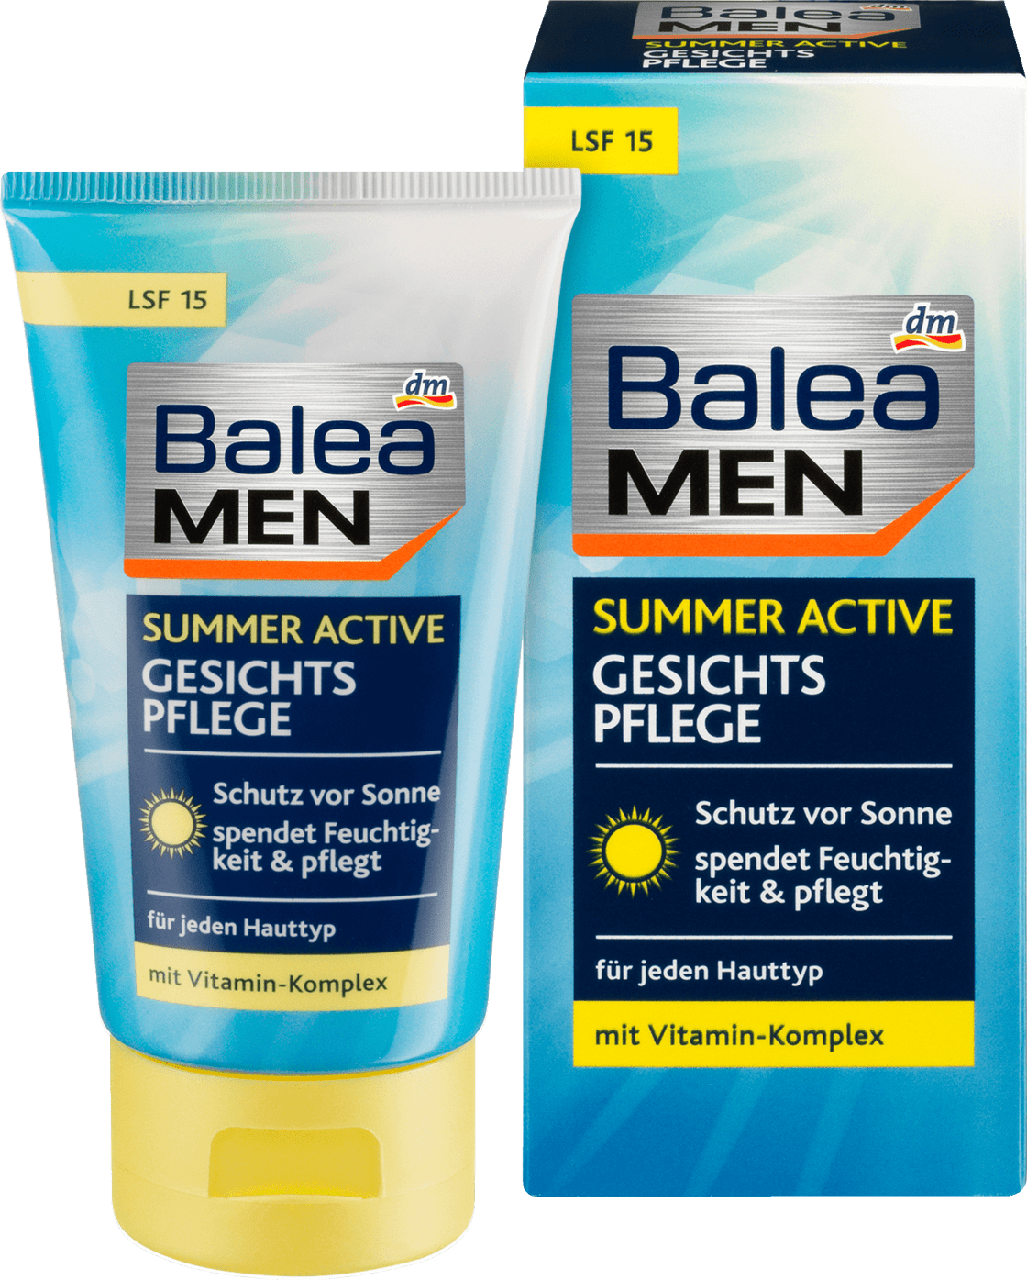 Летний активный уход за кожей лица Balea men Summer Active Gesichtspflege, 75 ml, фото 1